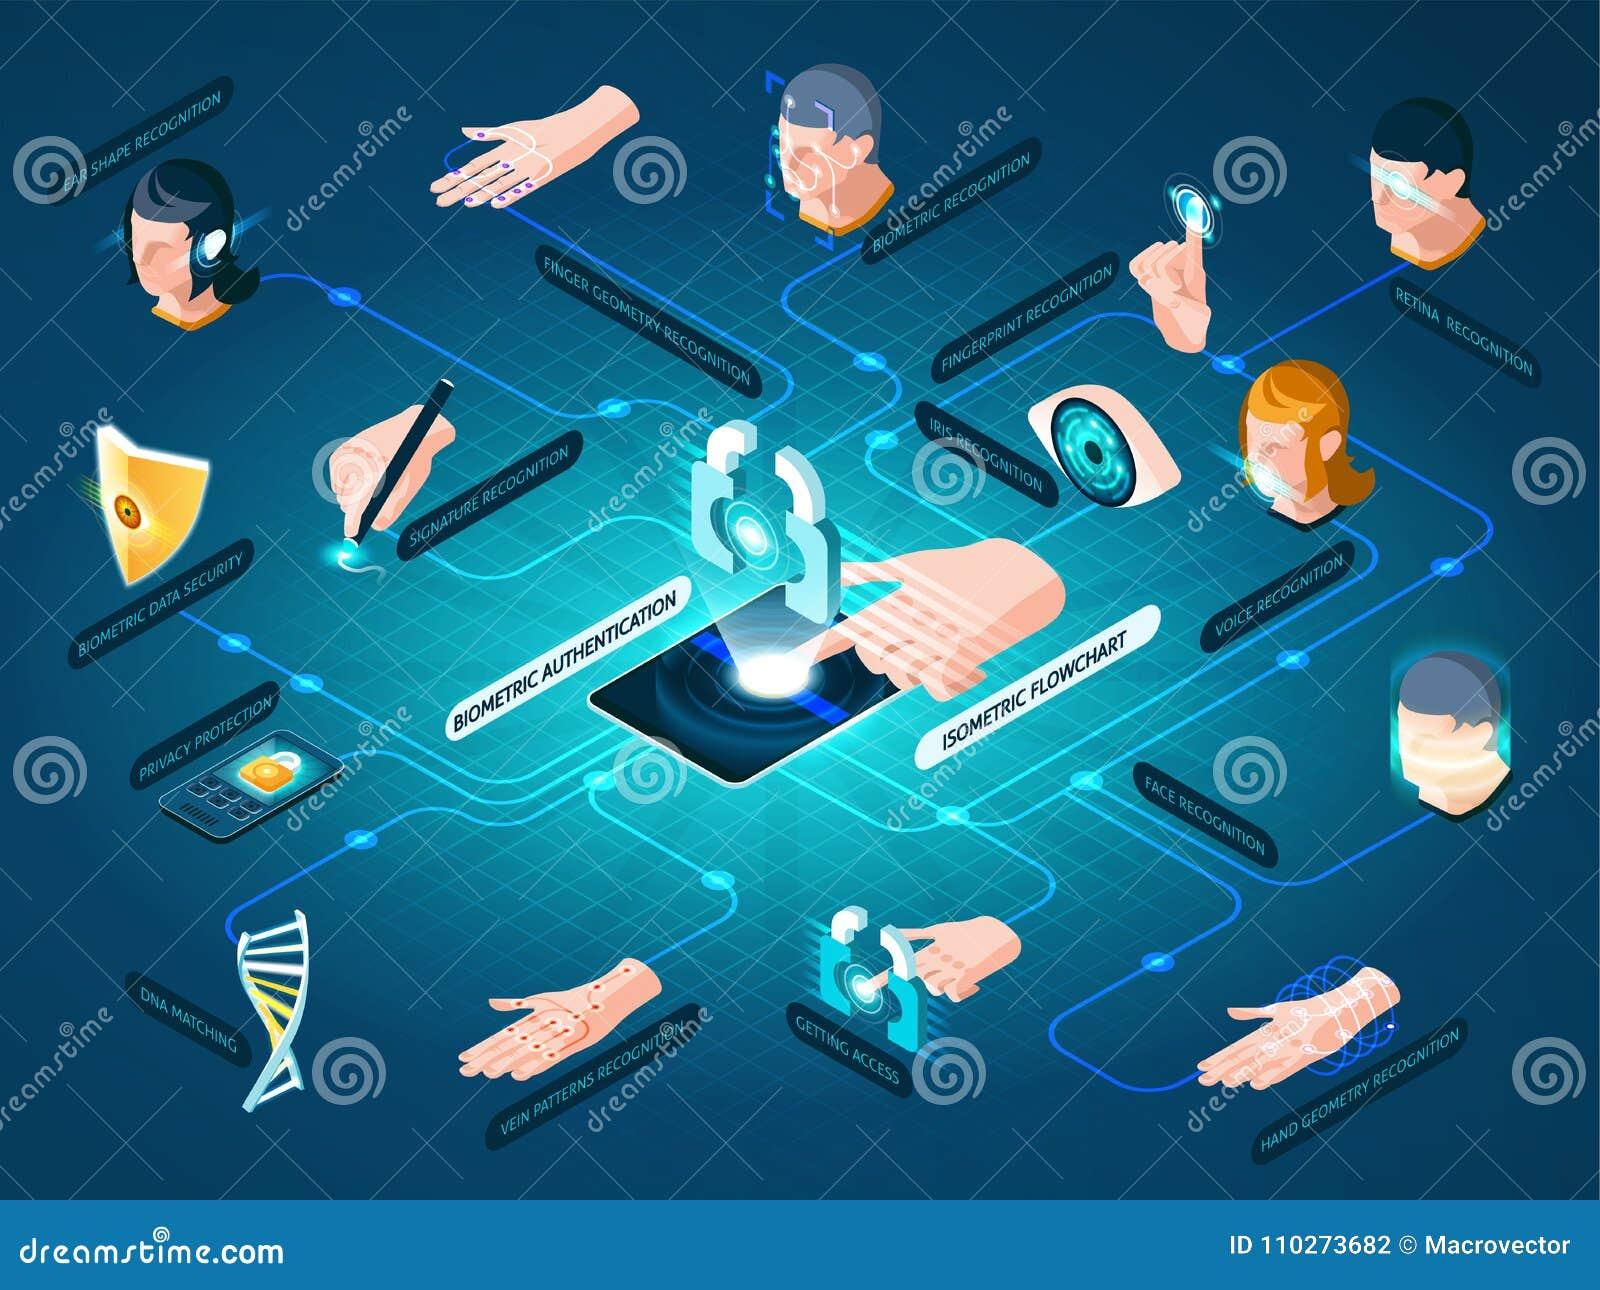 Biometric Authentication Methods Isometric Flowchart